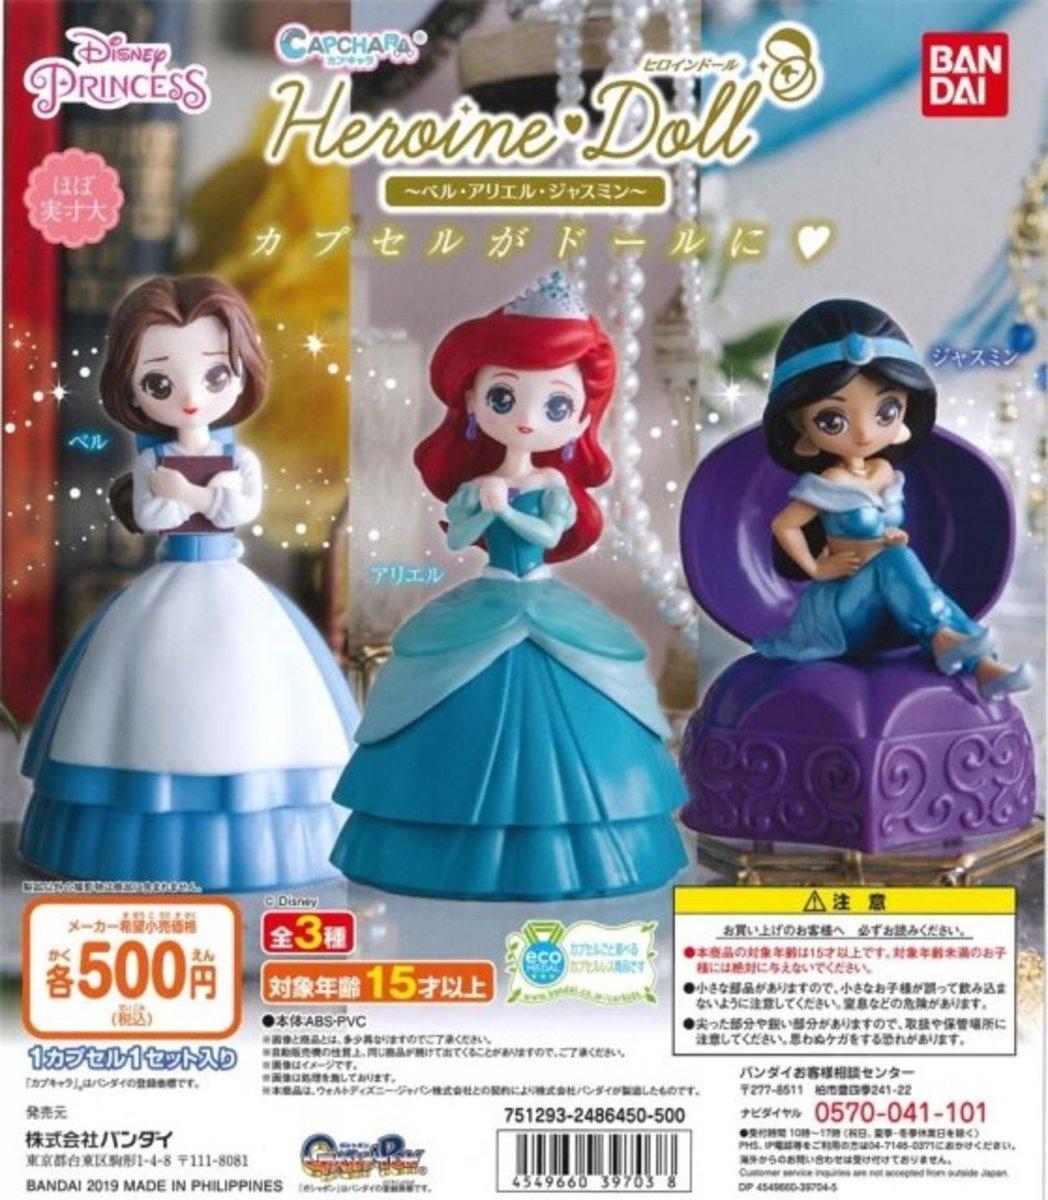 BANDAI Capchara Disney Princess Heroine Doll Capchara vol.5 (Full-set 3 Pcs)